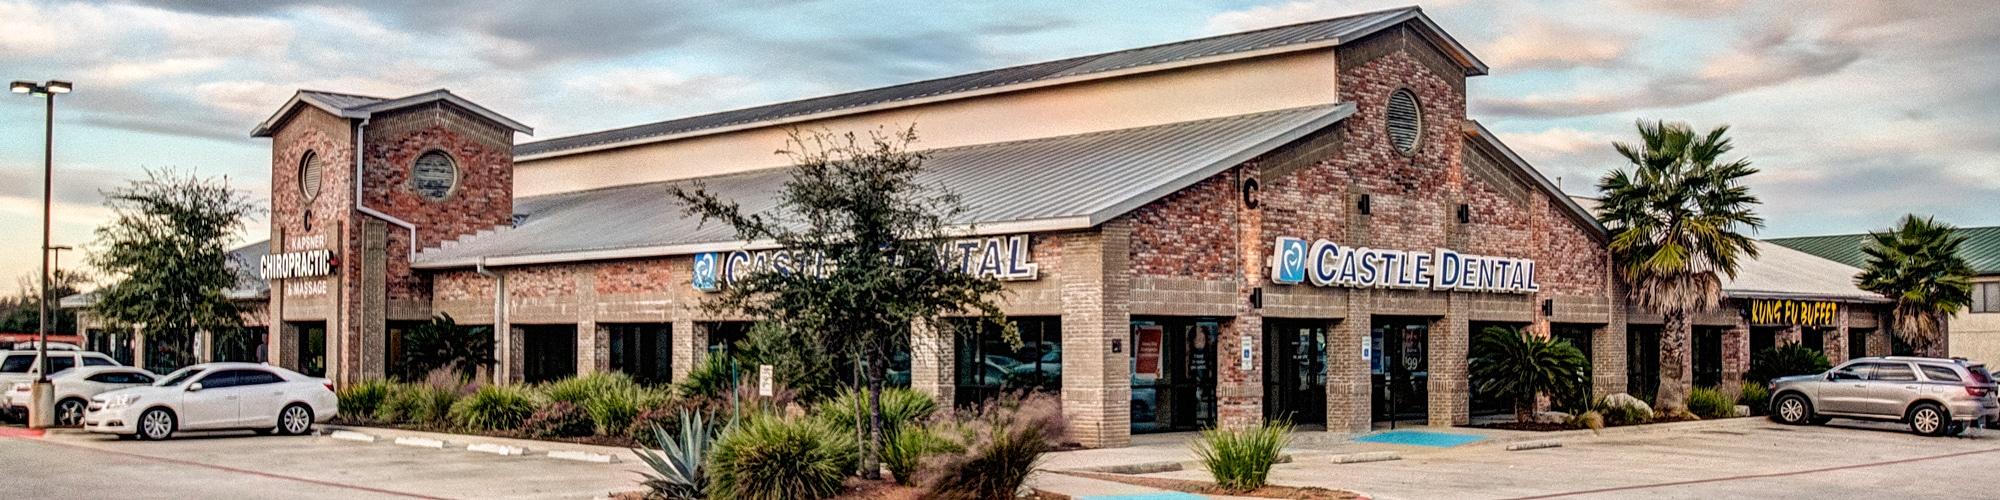 The Depot Center | 401 East Whitestone Boulevard in Cedar Park, Texas